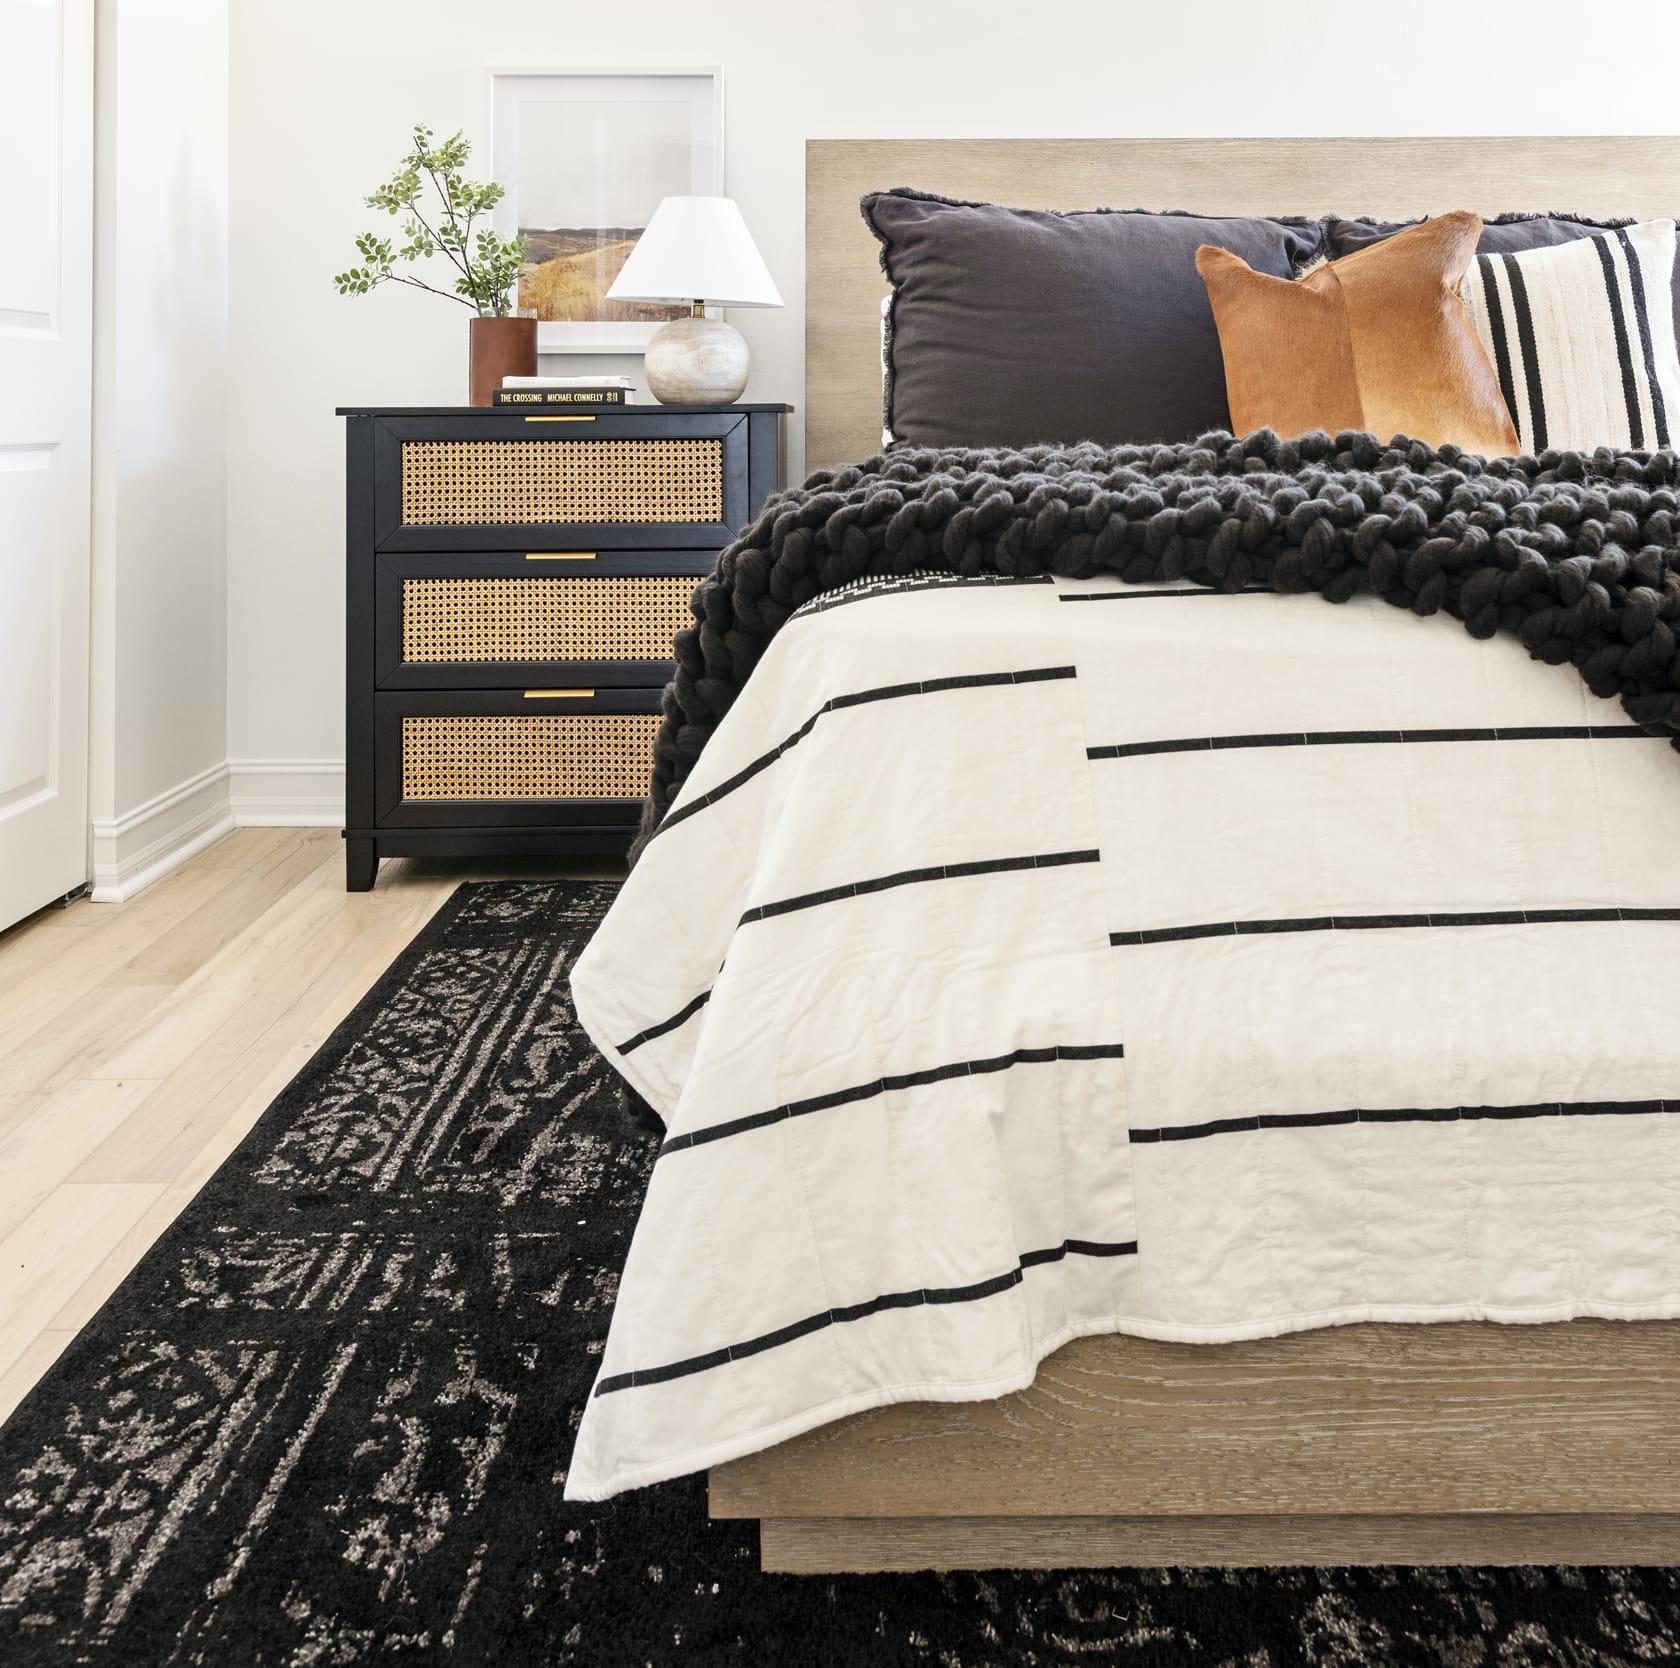 White Bedroom Black Rug Pillows Cow Skin White Black Pin Strip Bedsheets Wicker Faced Dresser Crop